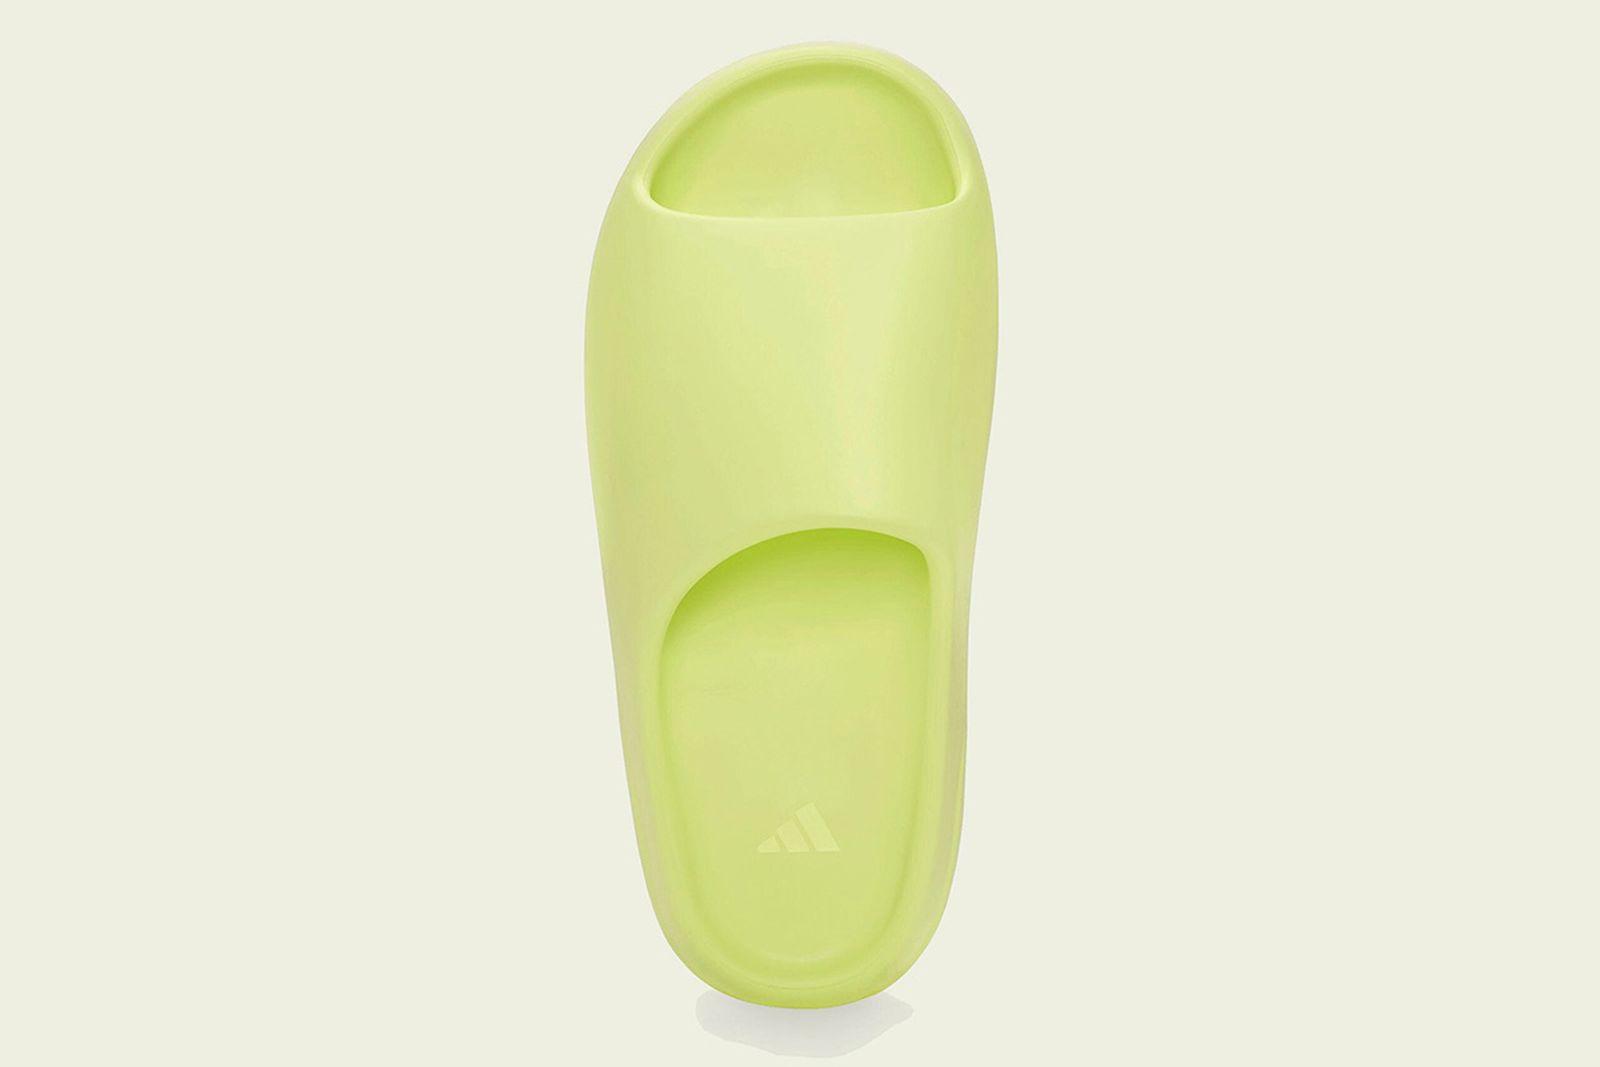 adidas-yeezy-slide-green-glow-release-date-info-price-02